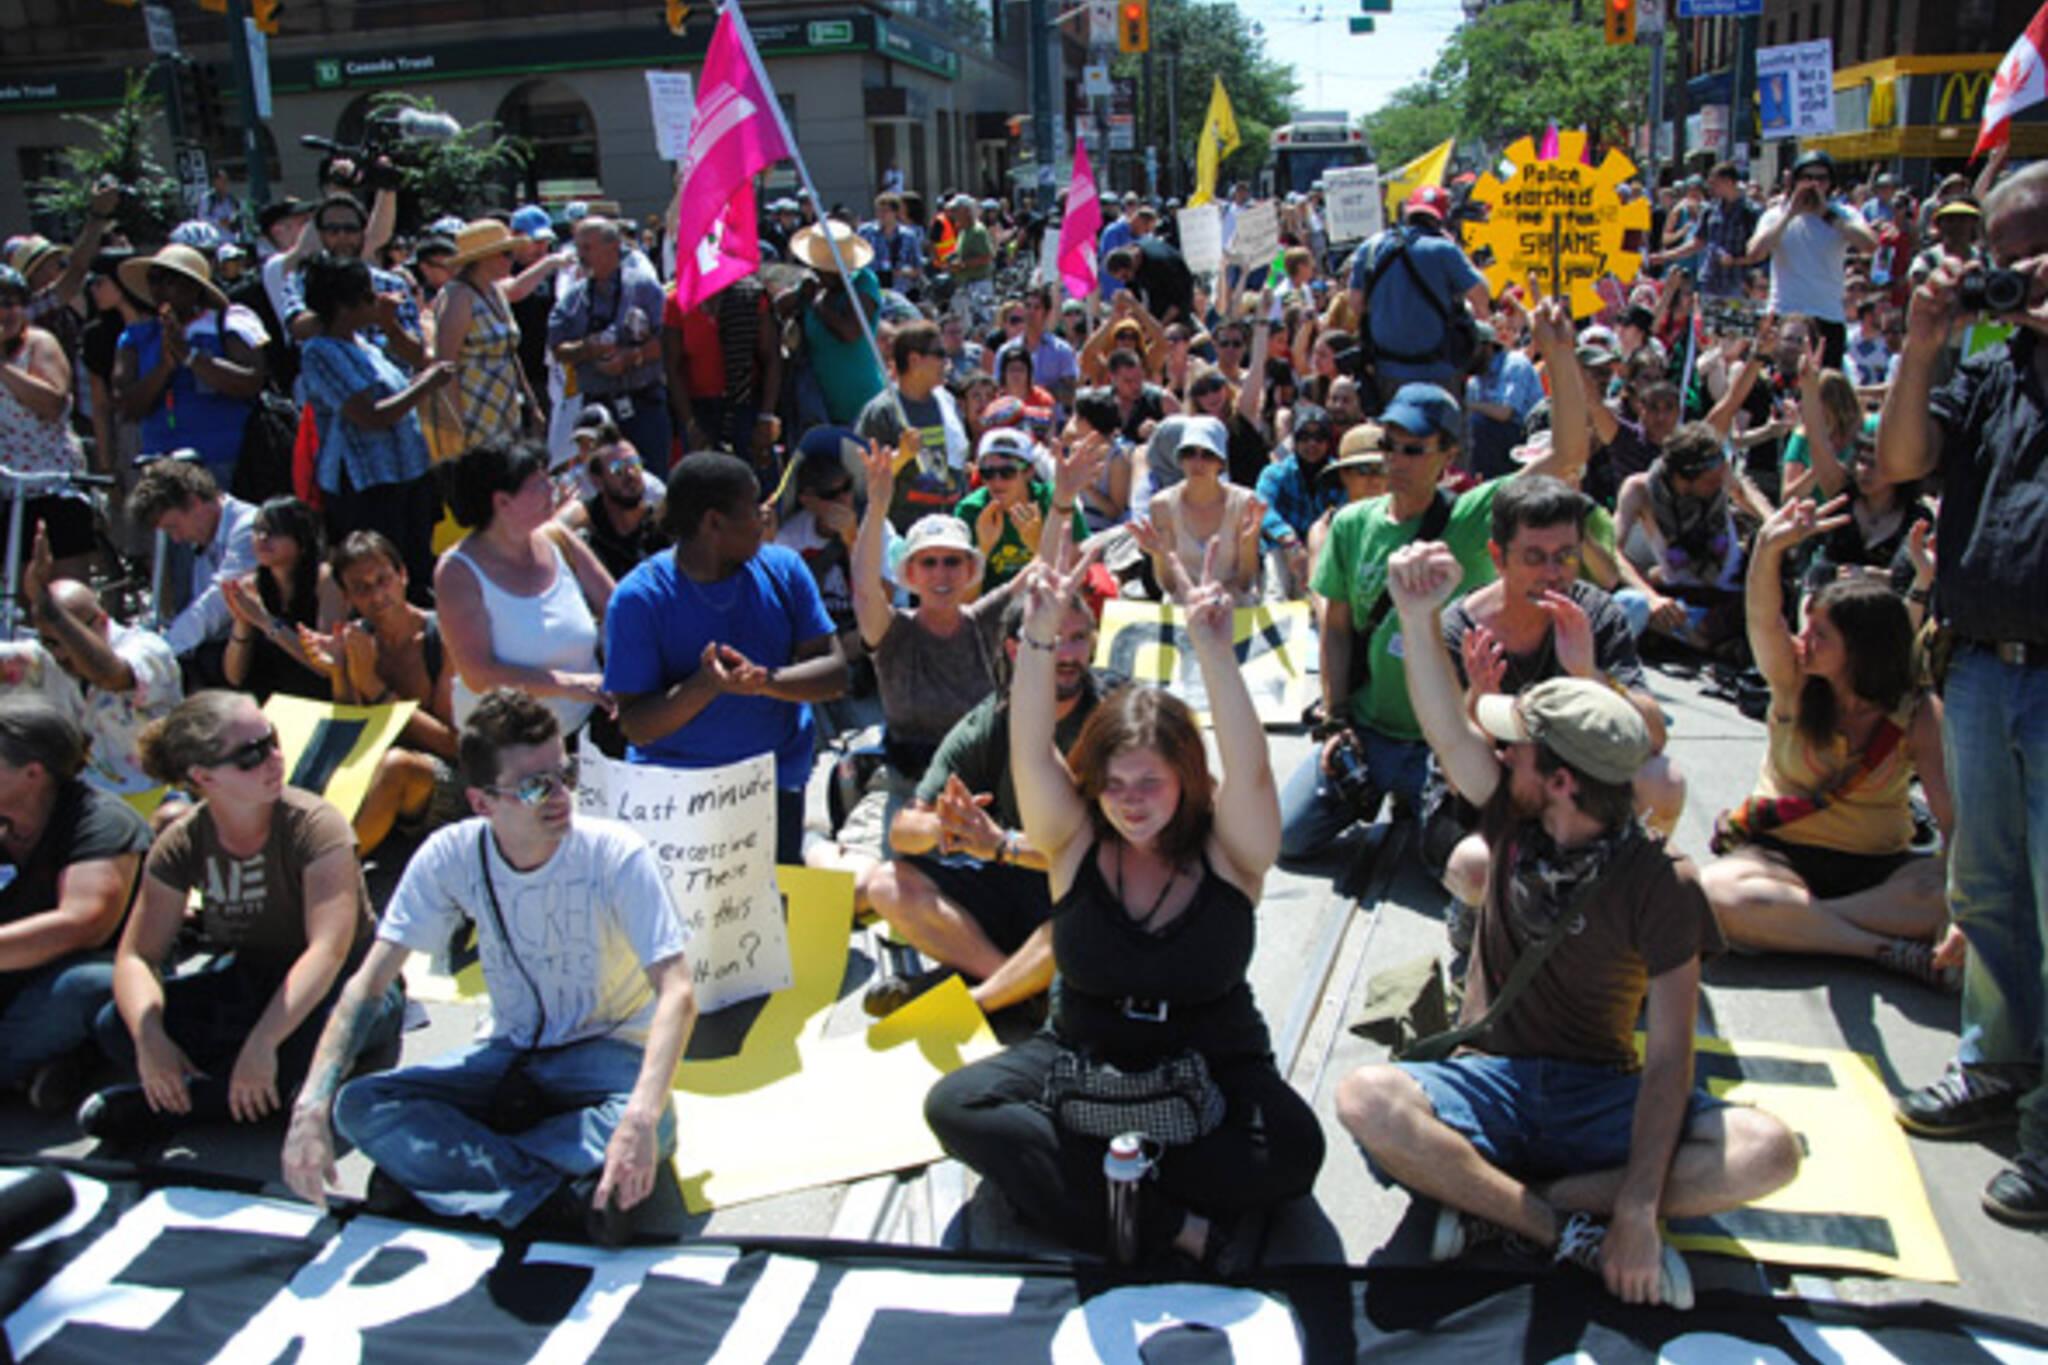 CAPP protest